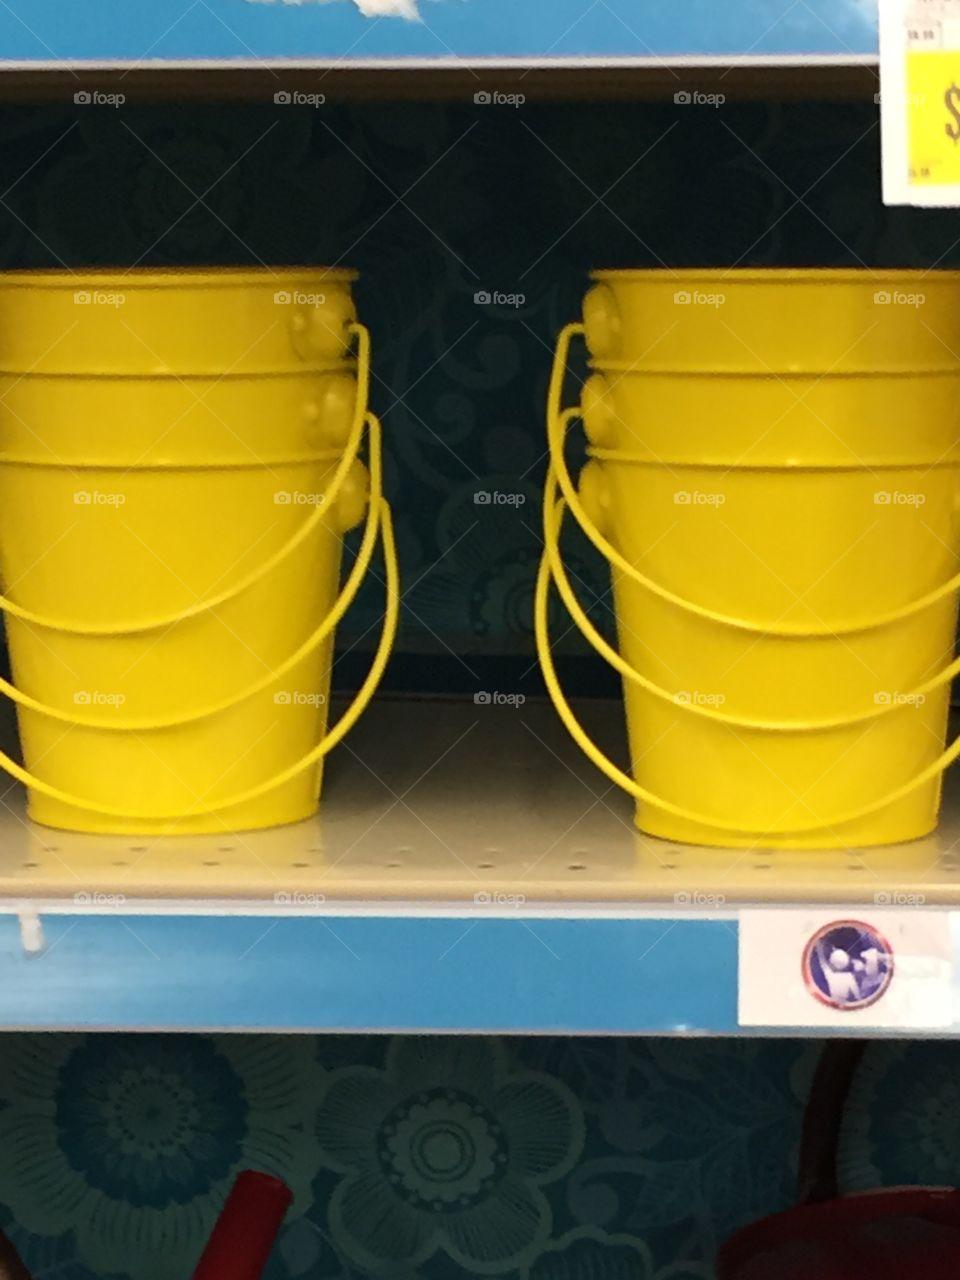 Yellow pails